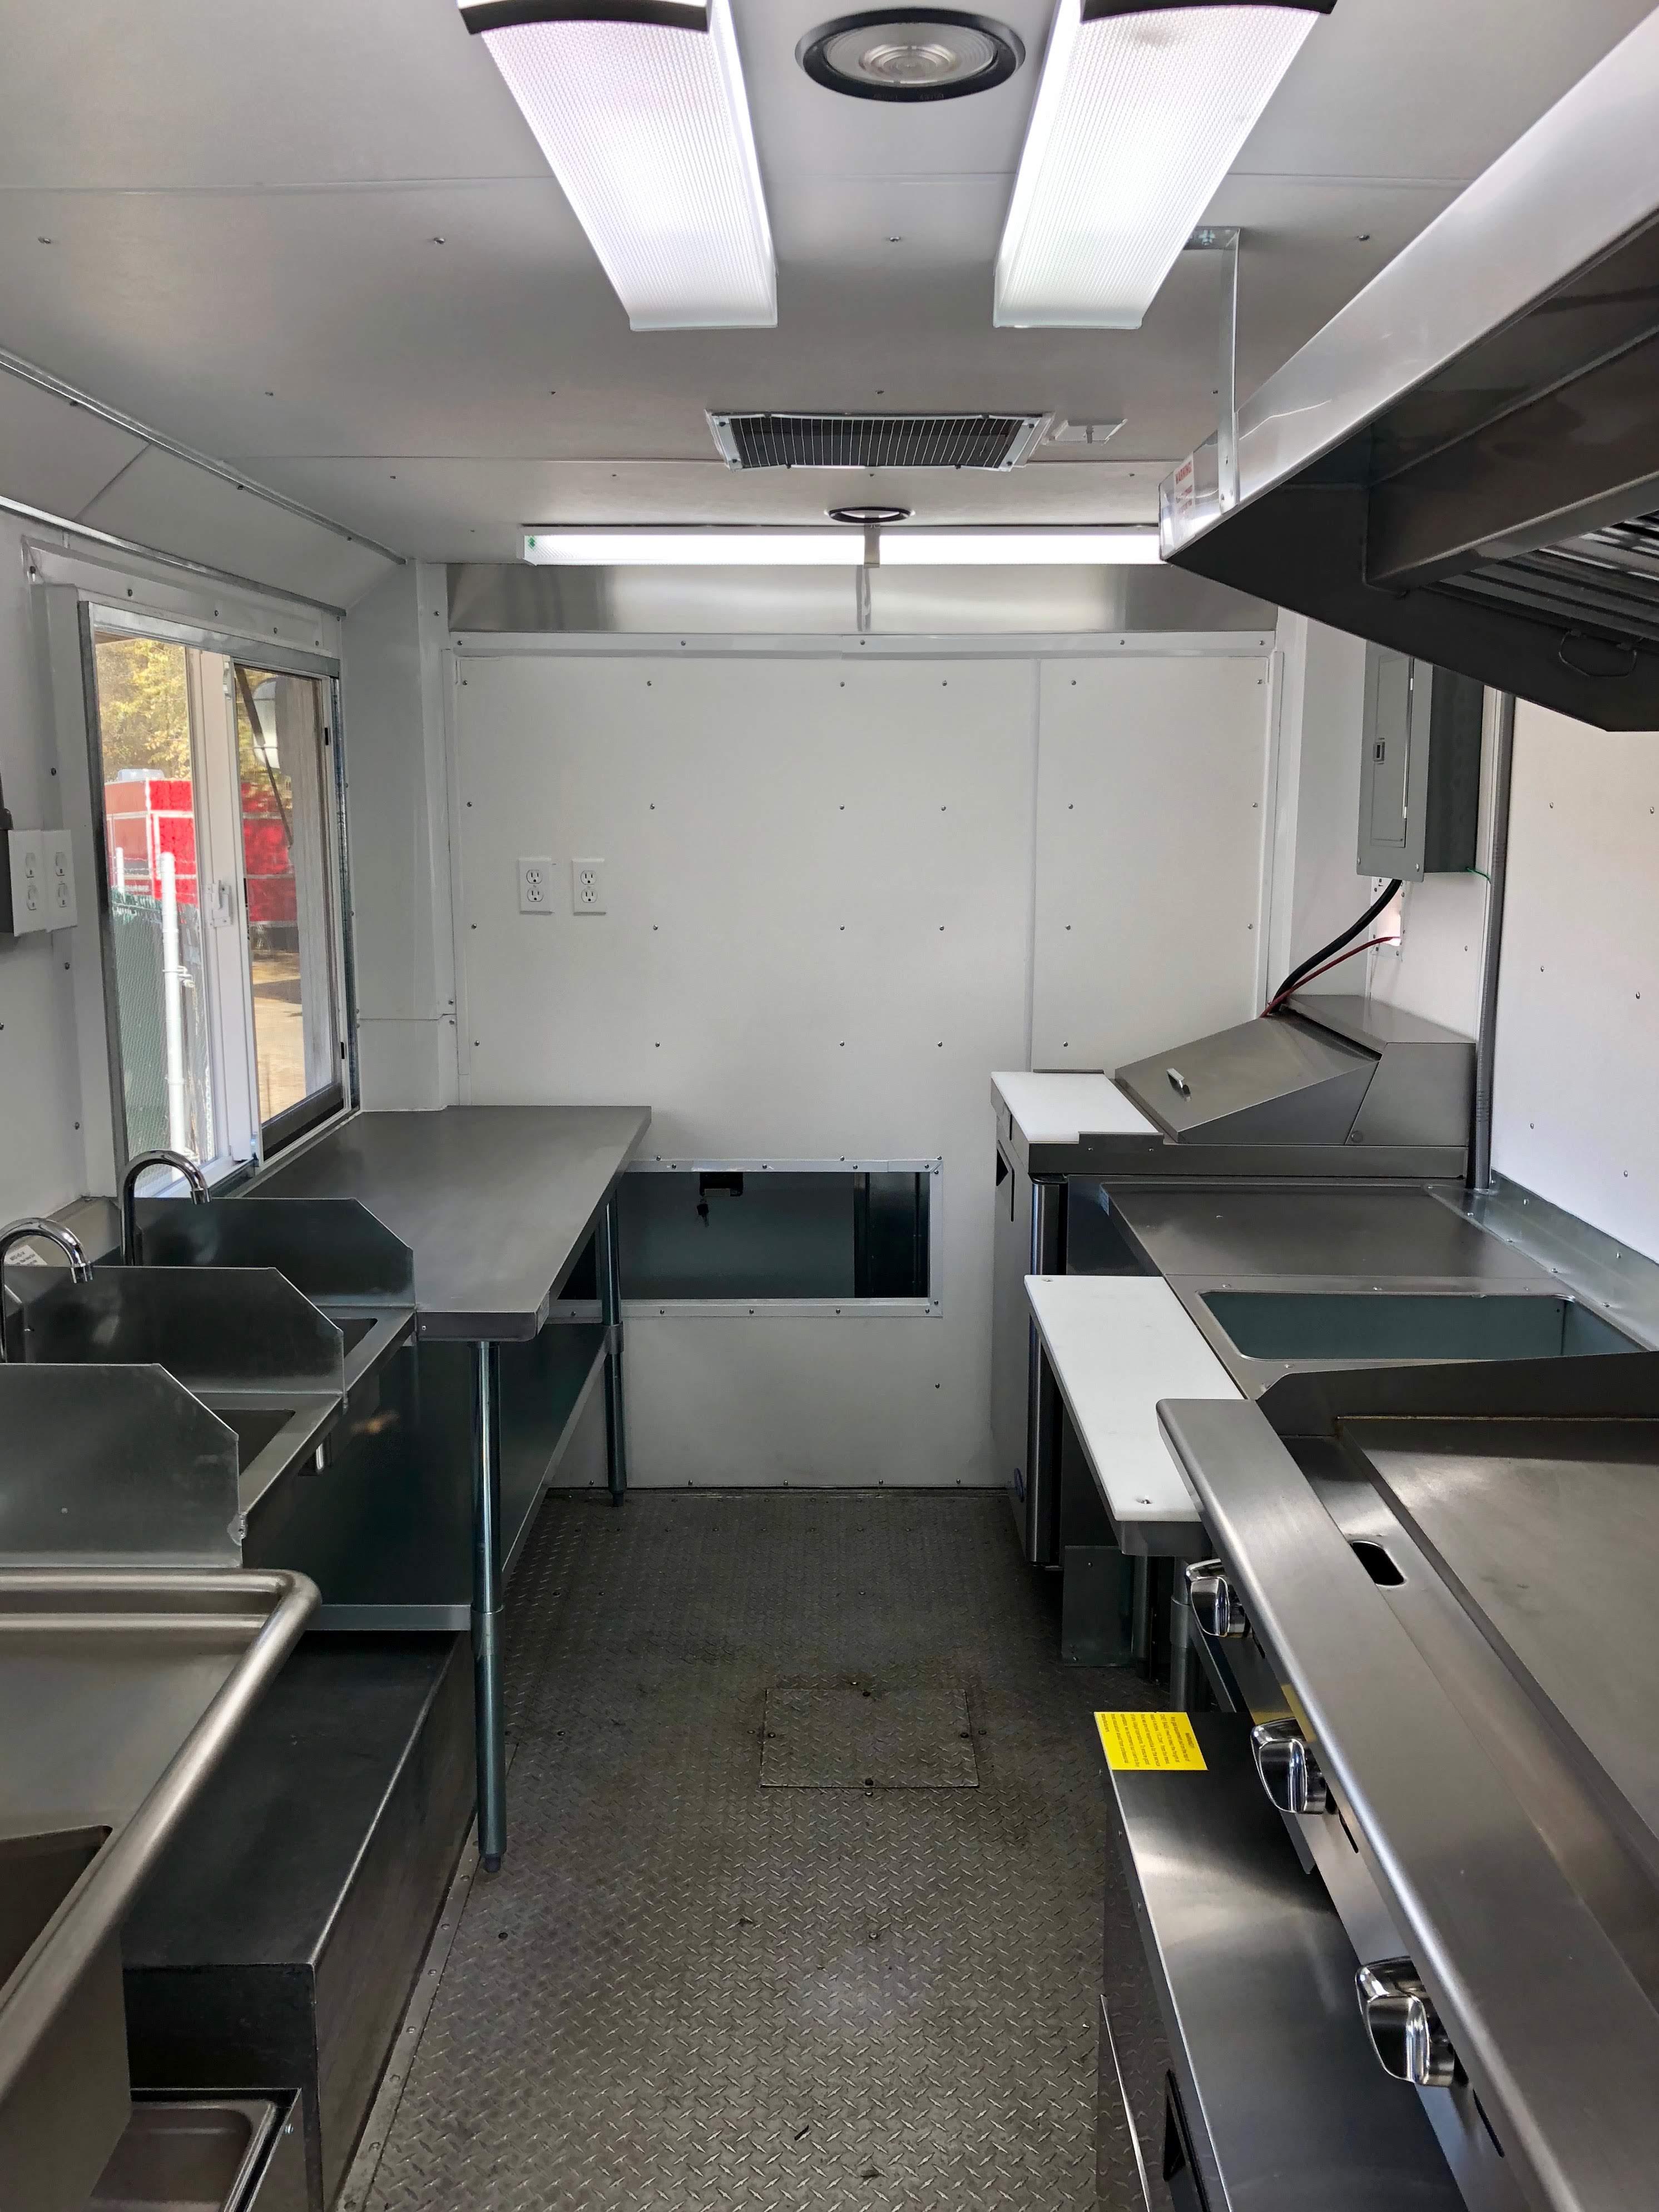 Idaho Foodtruck Kitchens